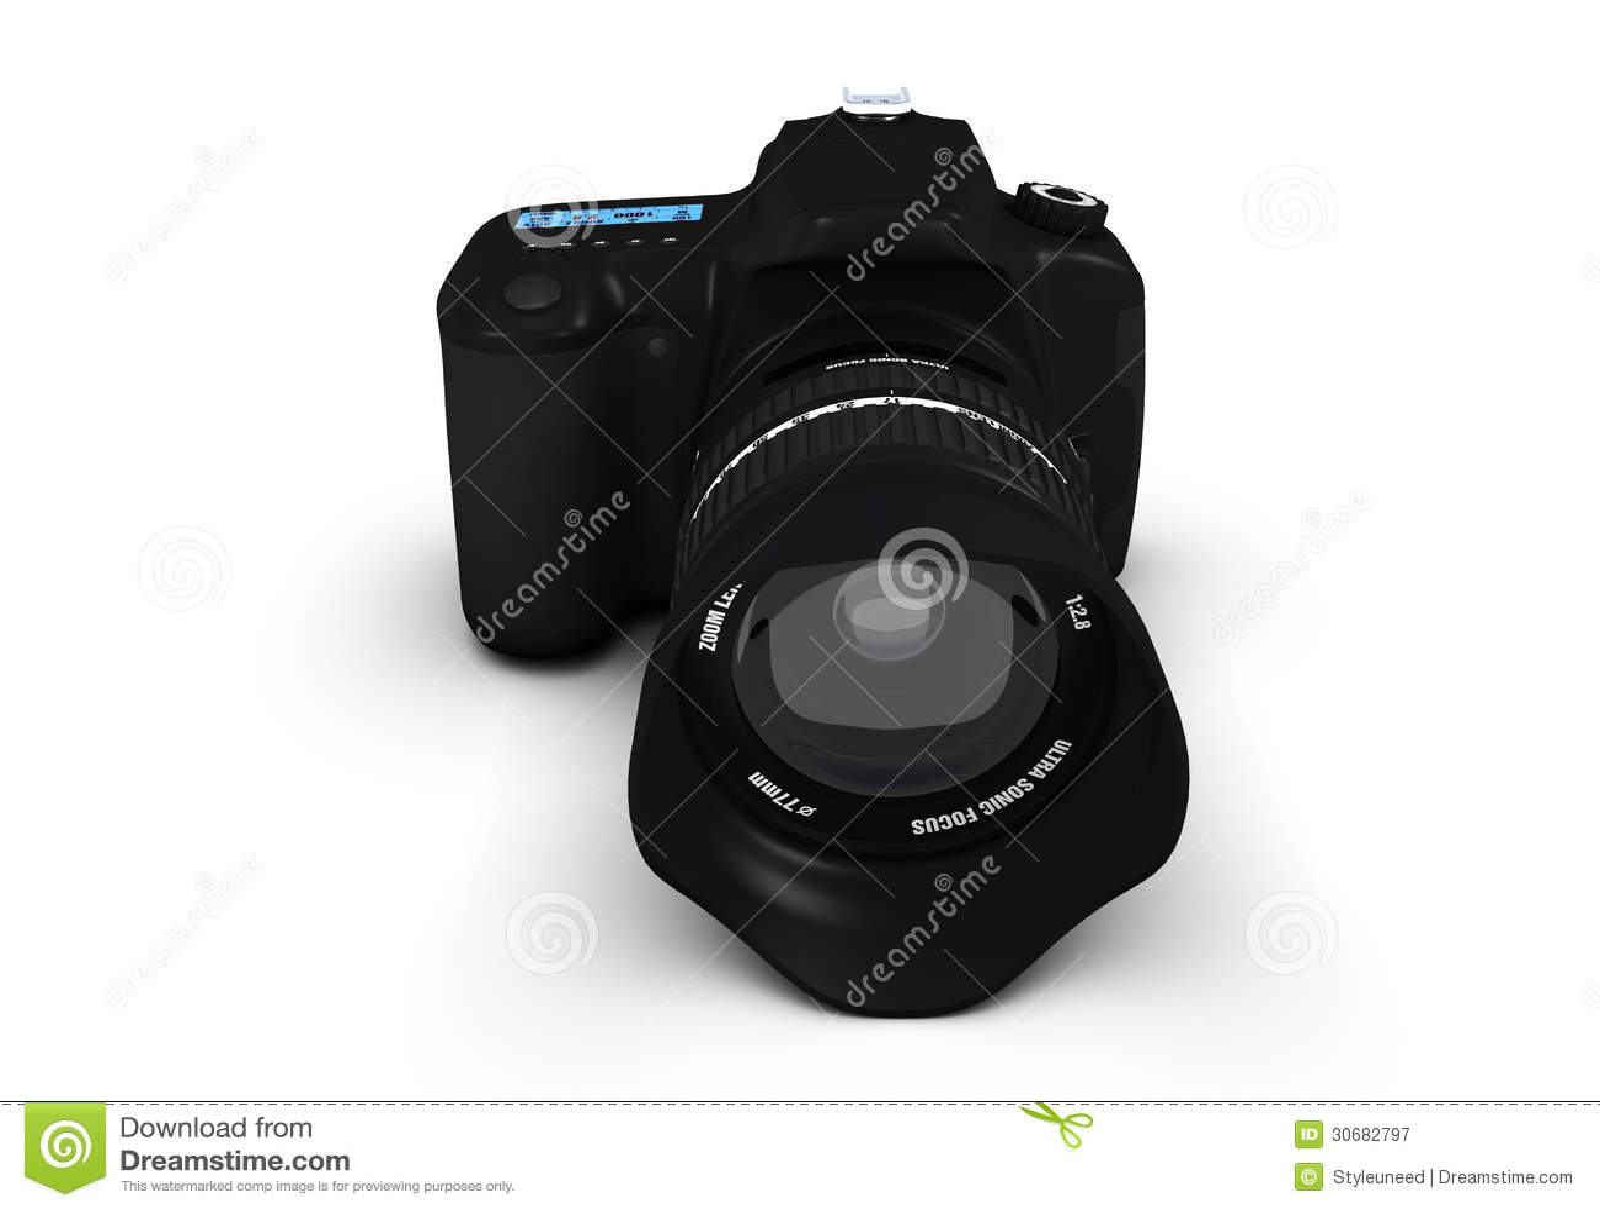 Camera 3d Dslr Camera dslr camera 3d model stock illustration image 57421229 of slr royalty free photography